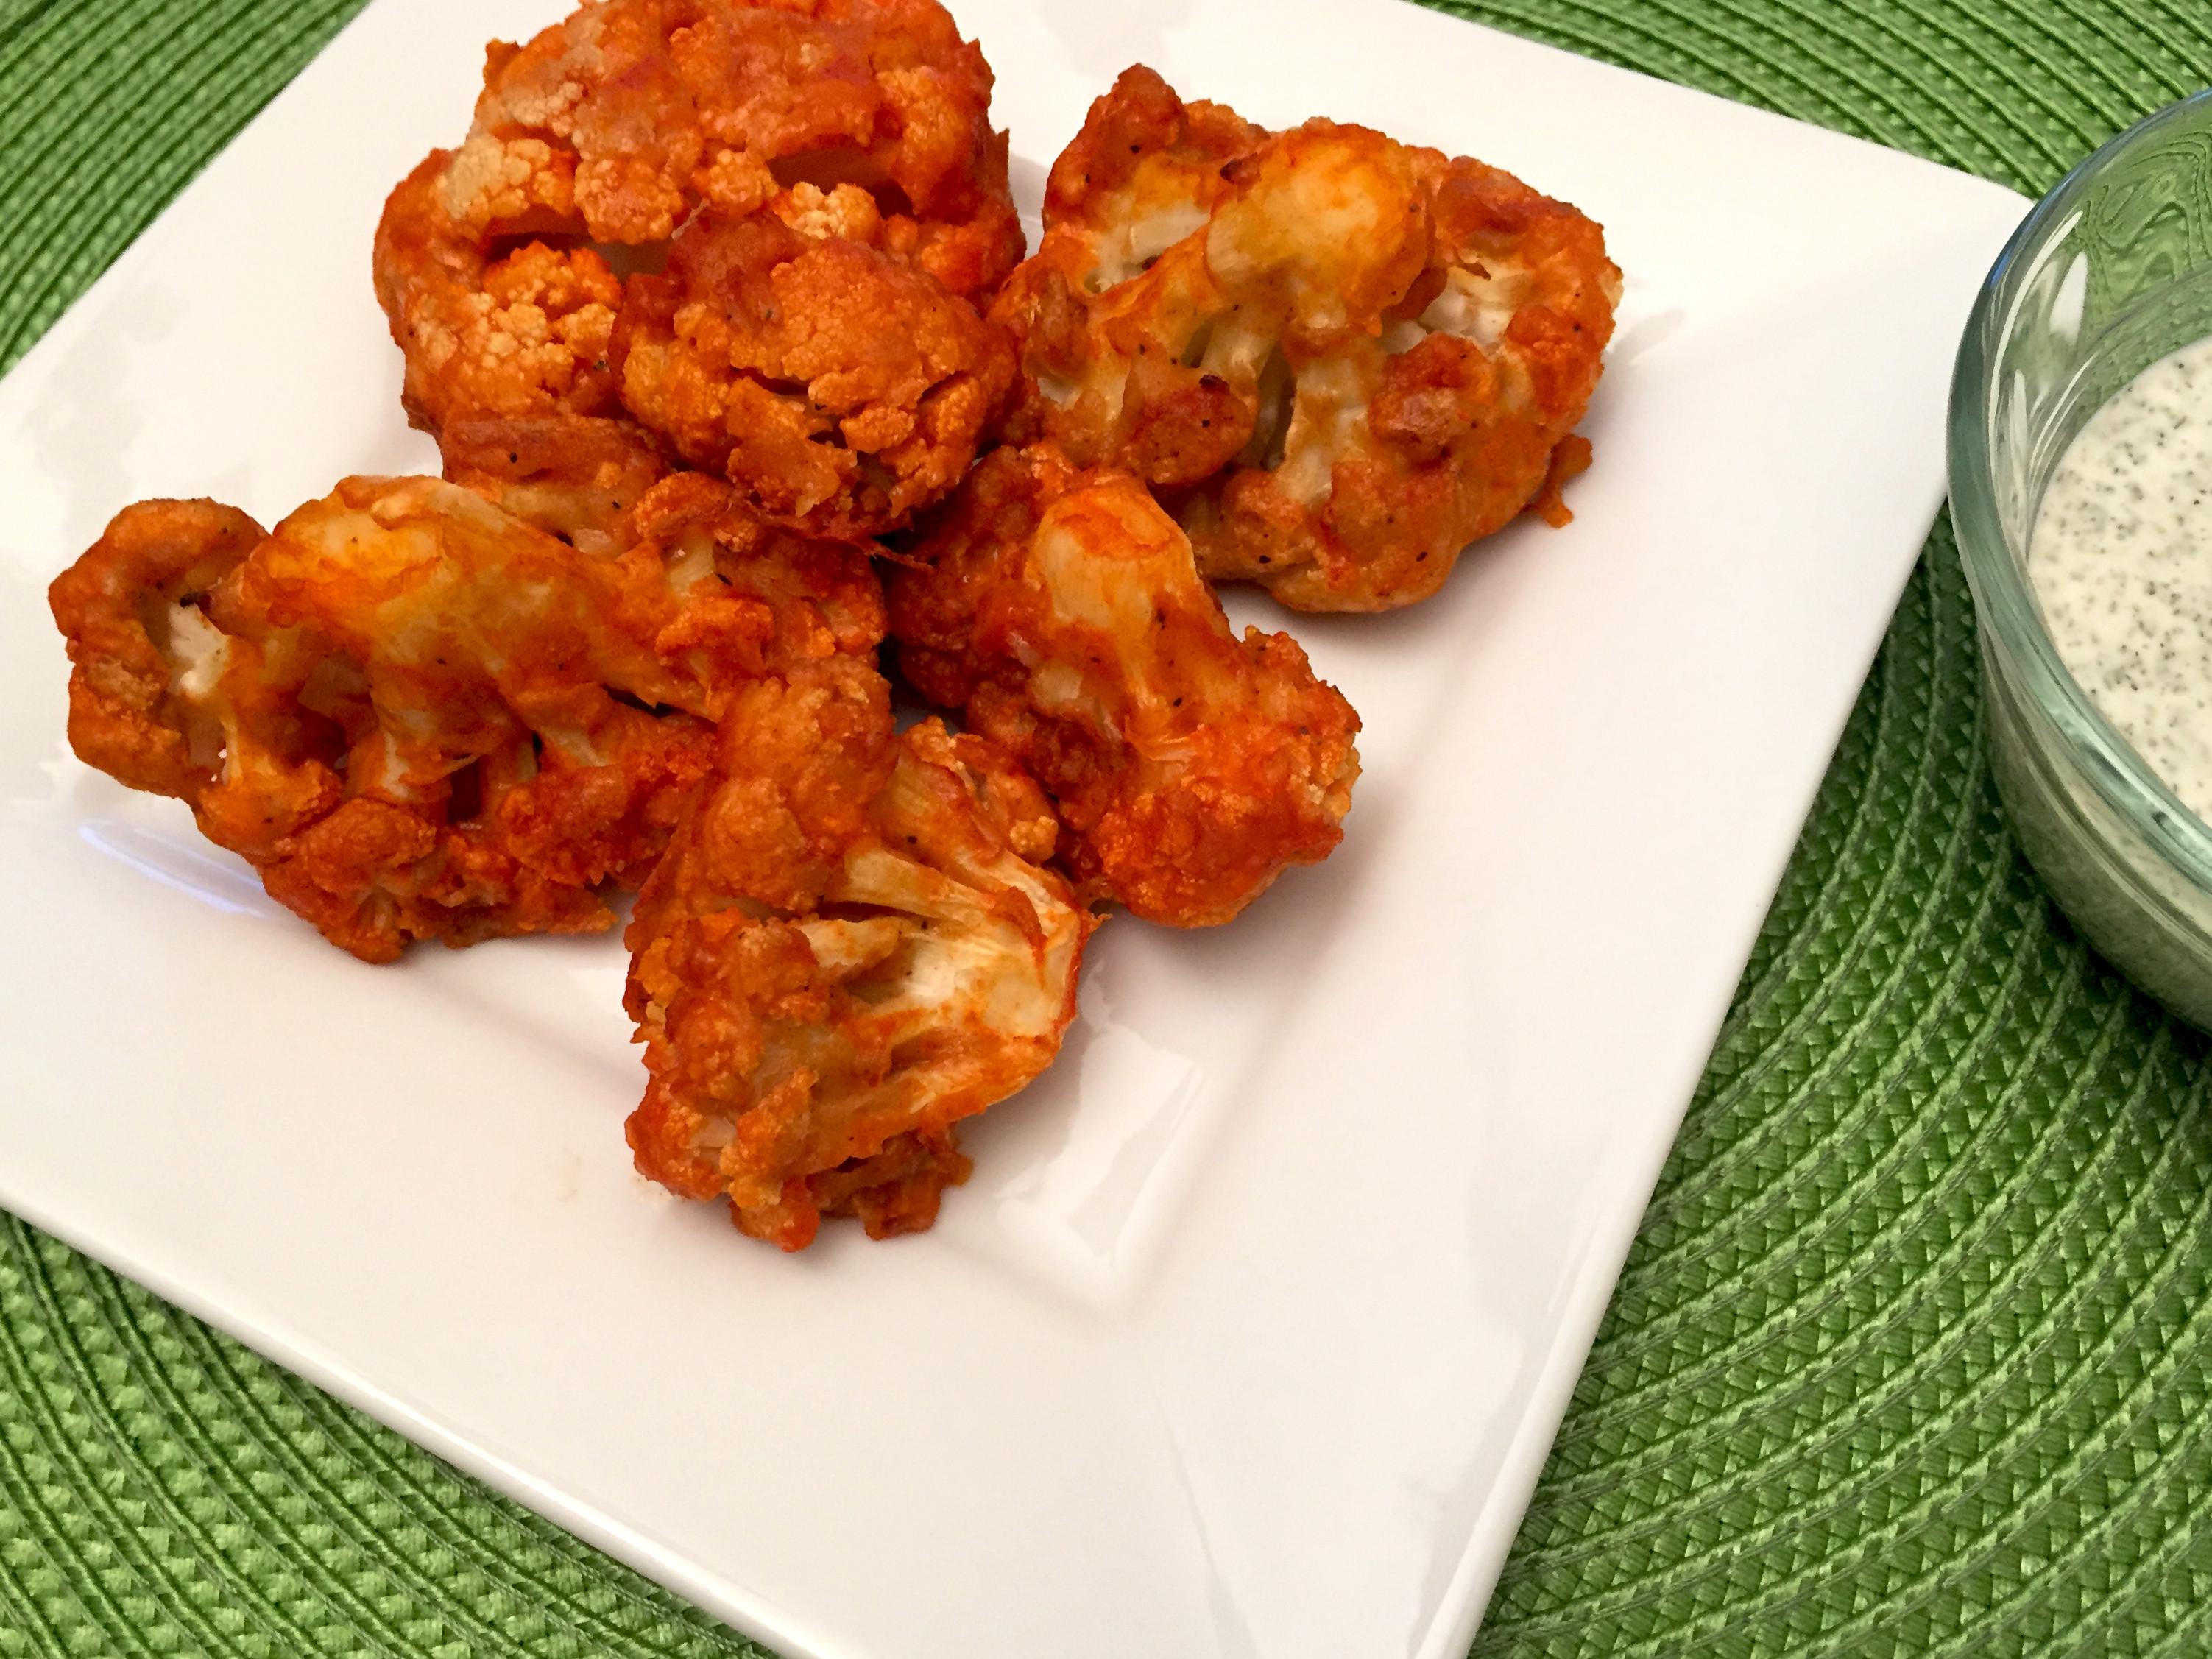 Vegan Cauliflower Wings  Vegan Cauliflower Buffalo Wings Simply Delicious LottaVeg